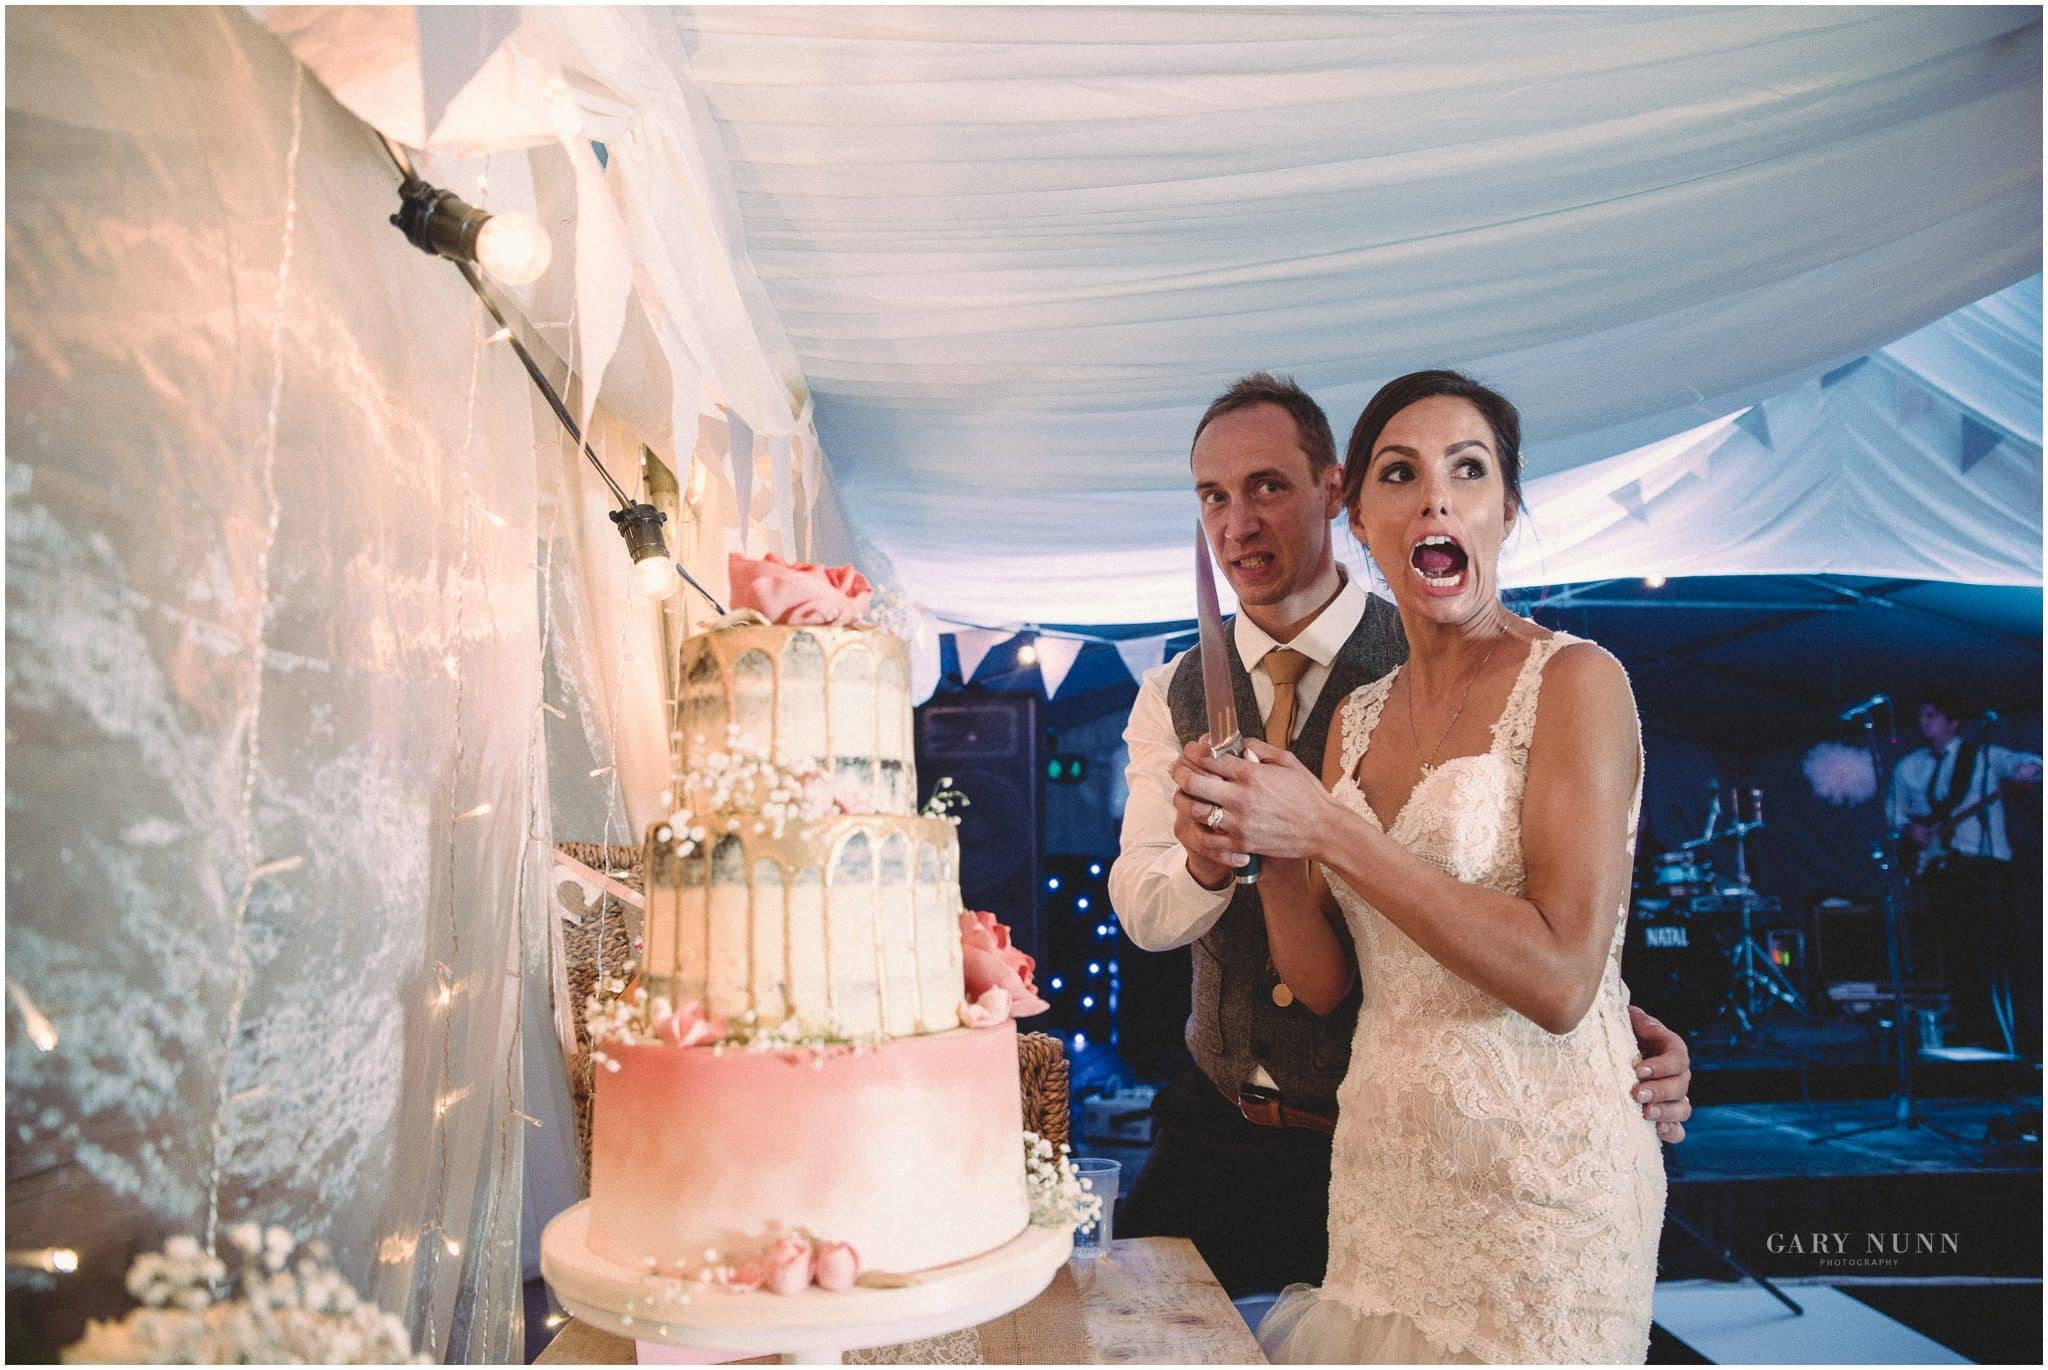 Milton Keynes Wedding Photographer, wedding photo checklist, first kiss, cake cutting, cutting of the cake,